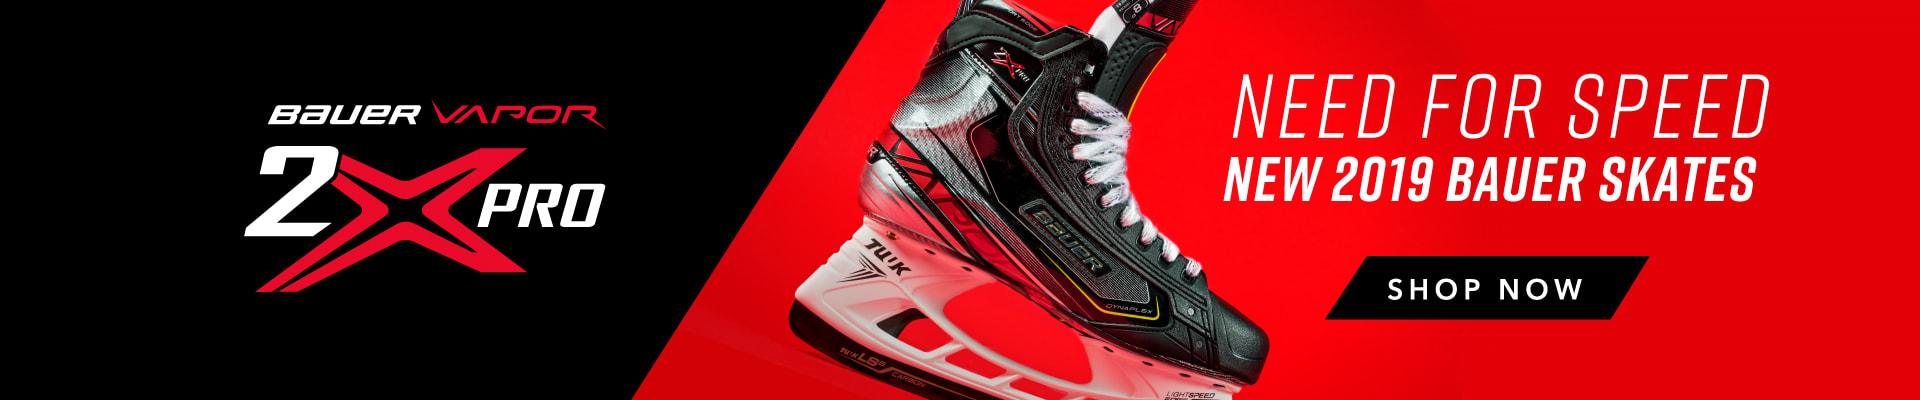 Shop New Vapor Skates